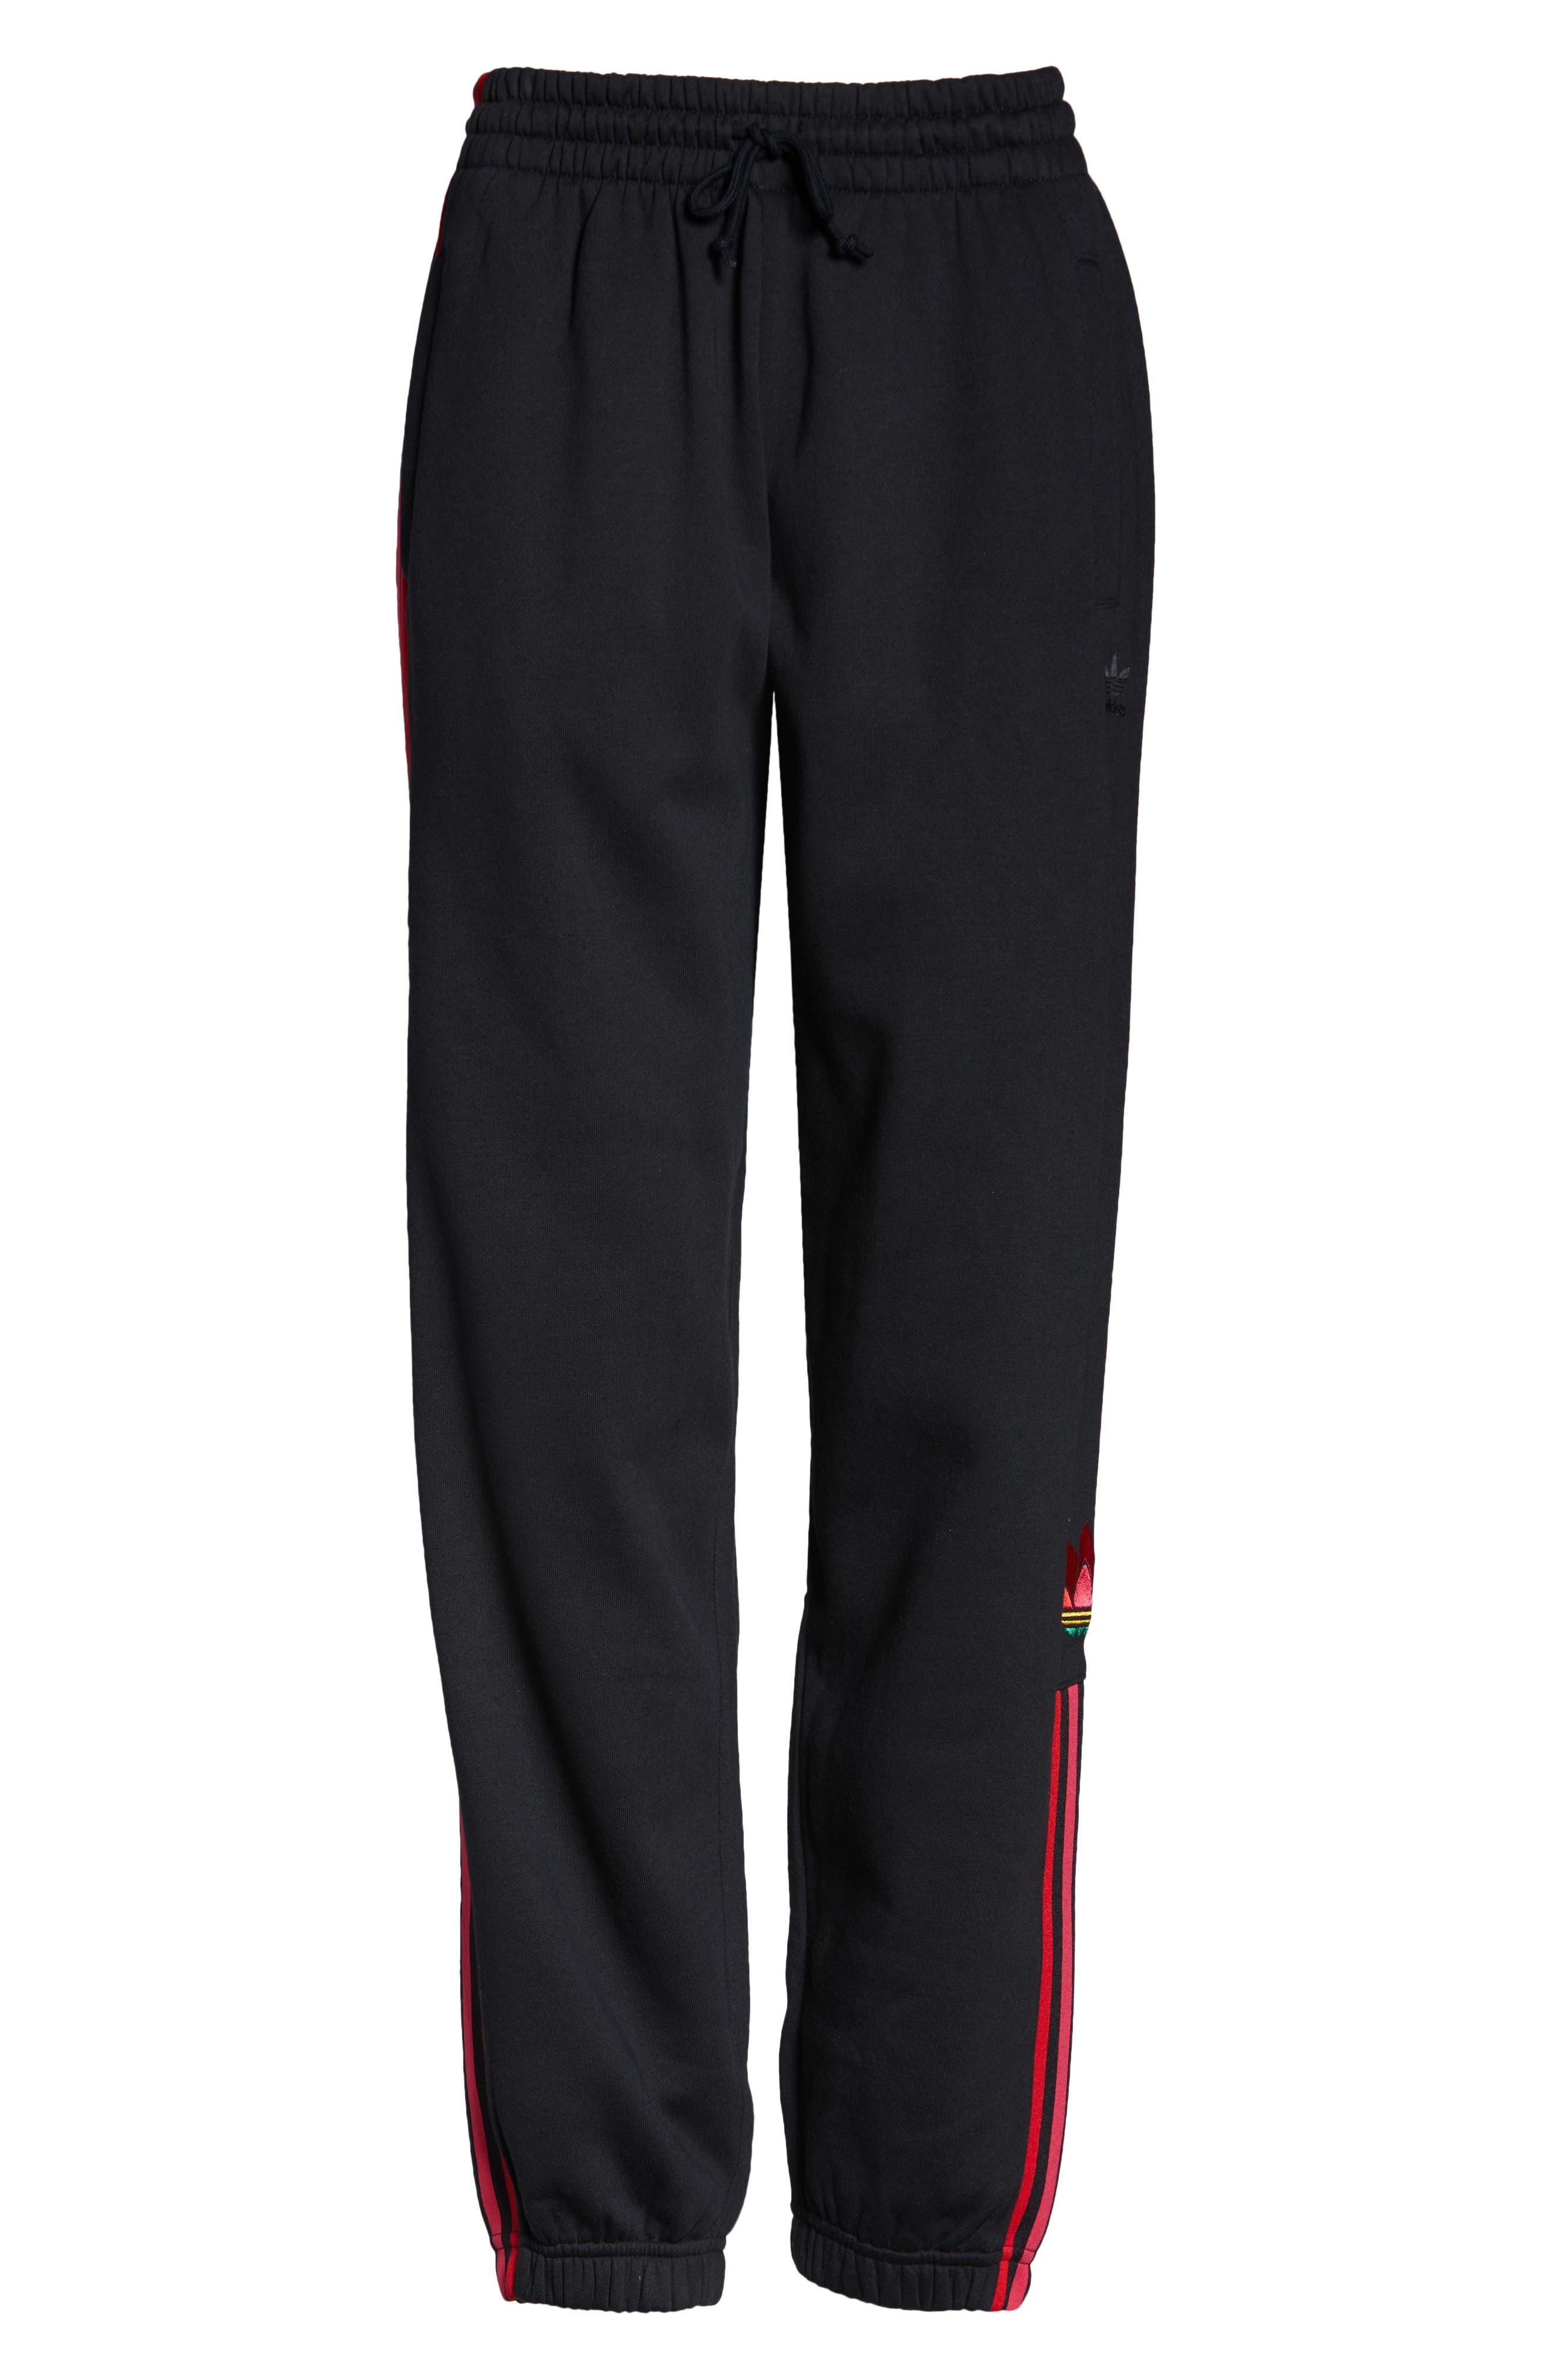 Women's Adidas Originals Women's Cuffed Sweatpants